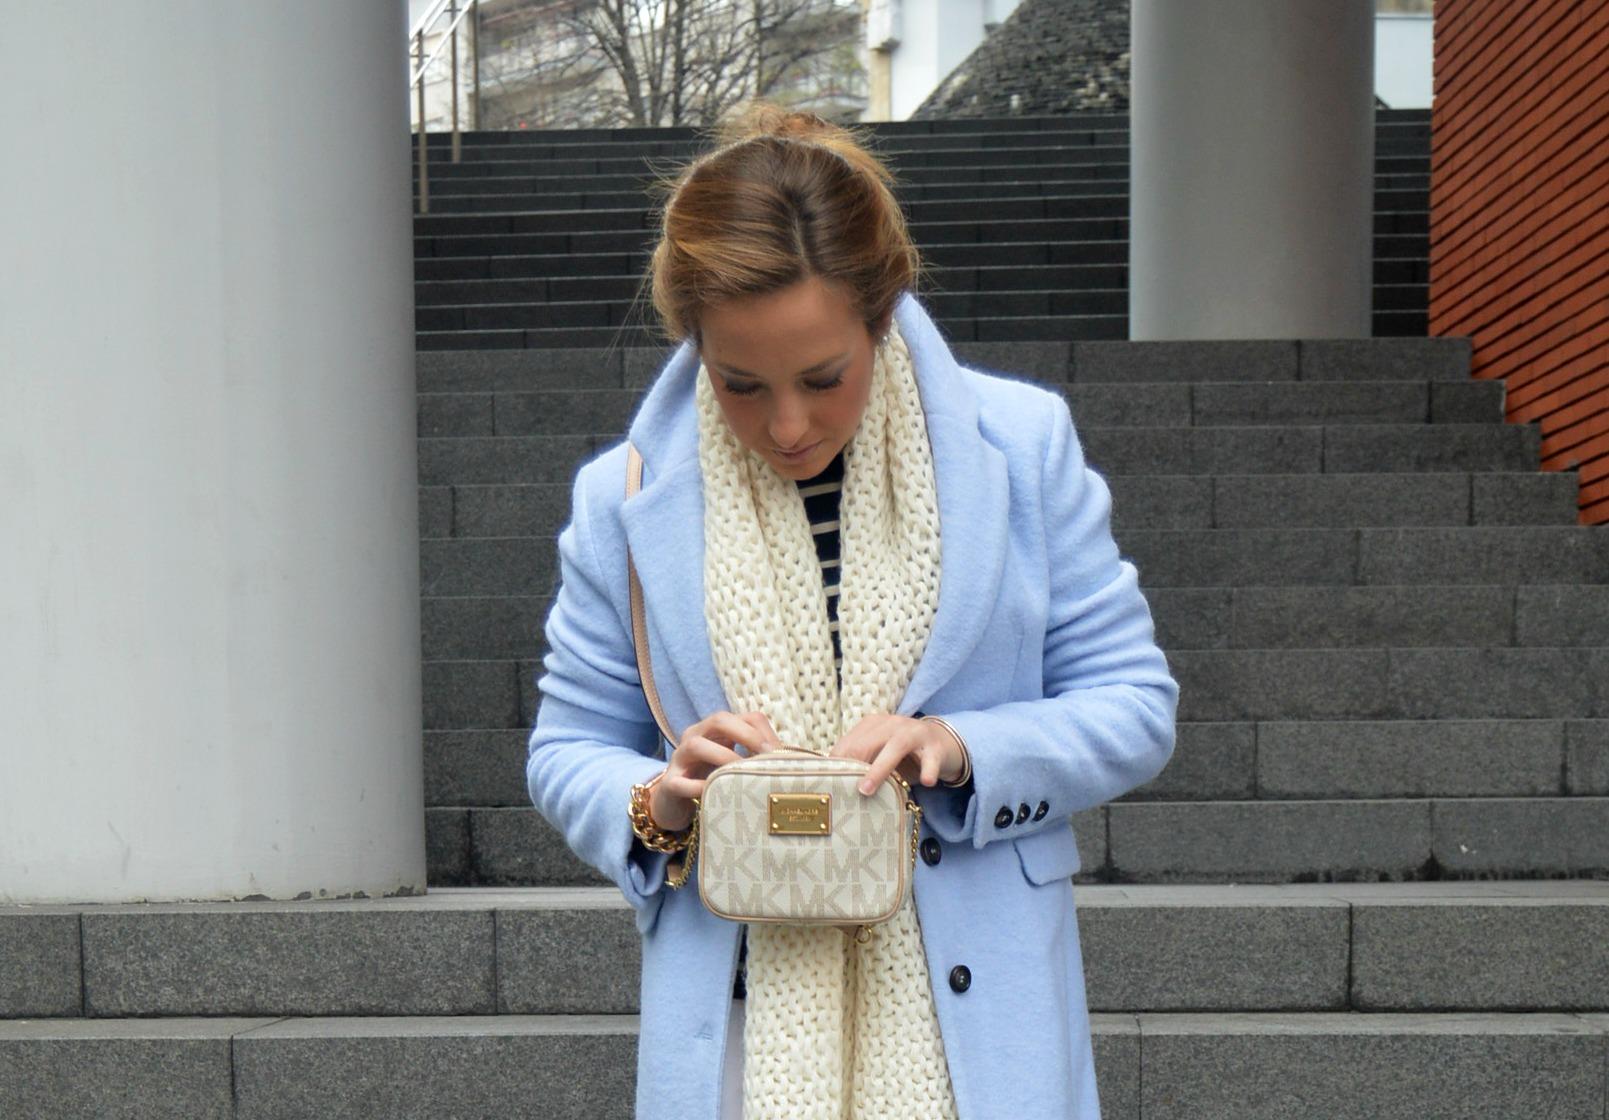 Abrigo azul lana bershka camiseta marinera azul marino pantalones blancos look invierno botas grises look claro bolso michael kors